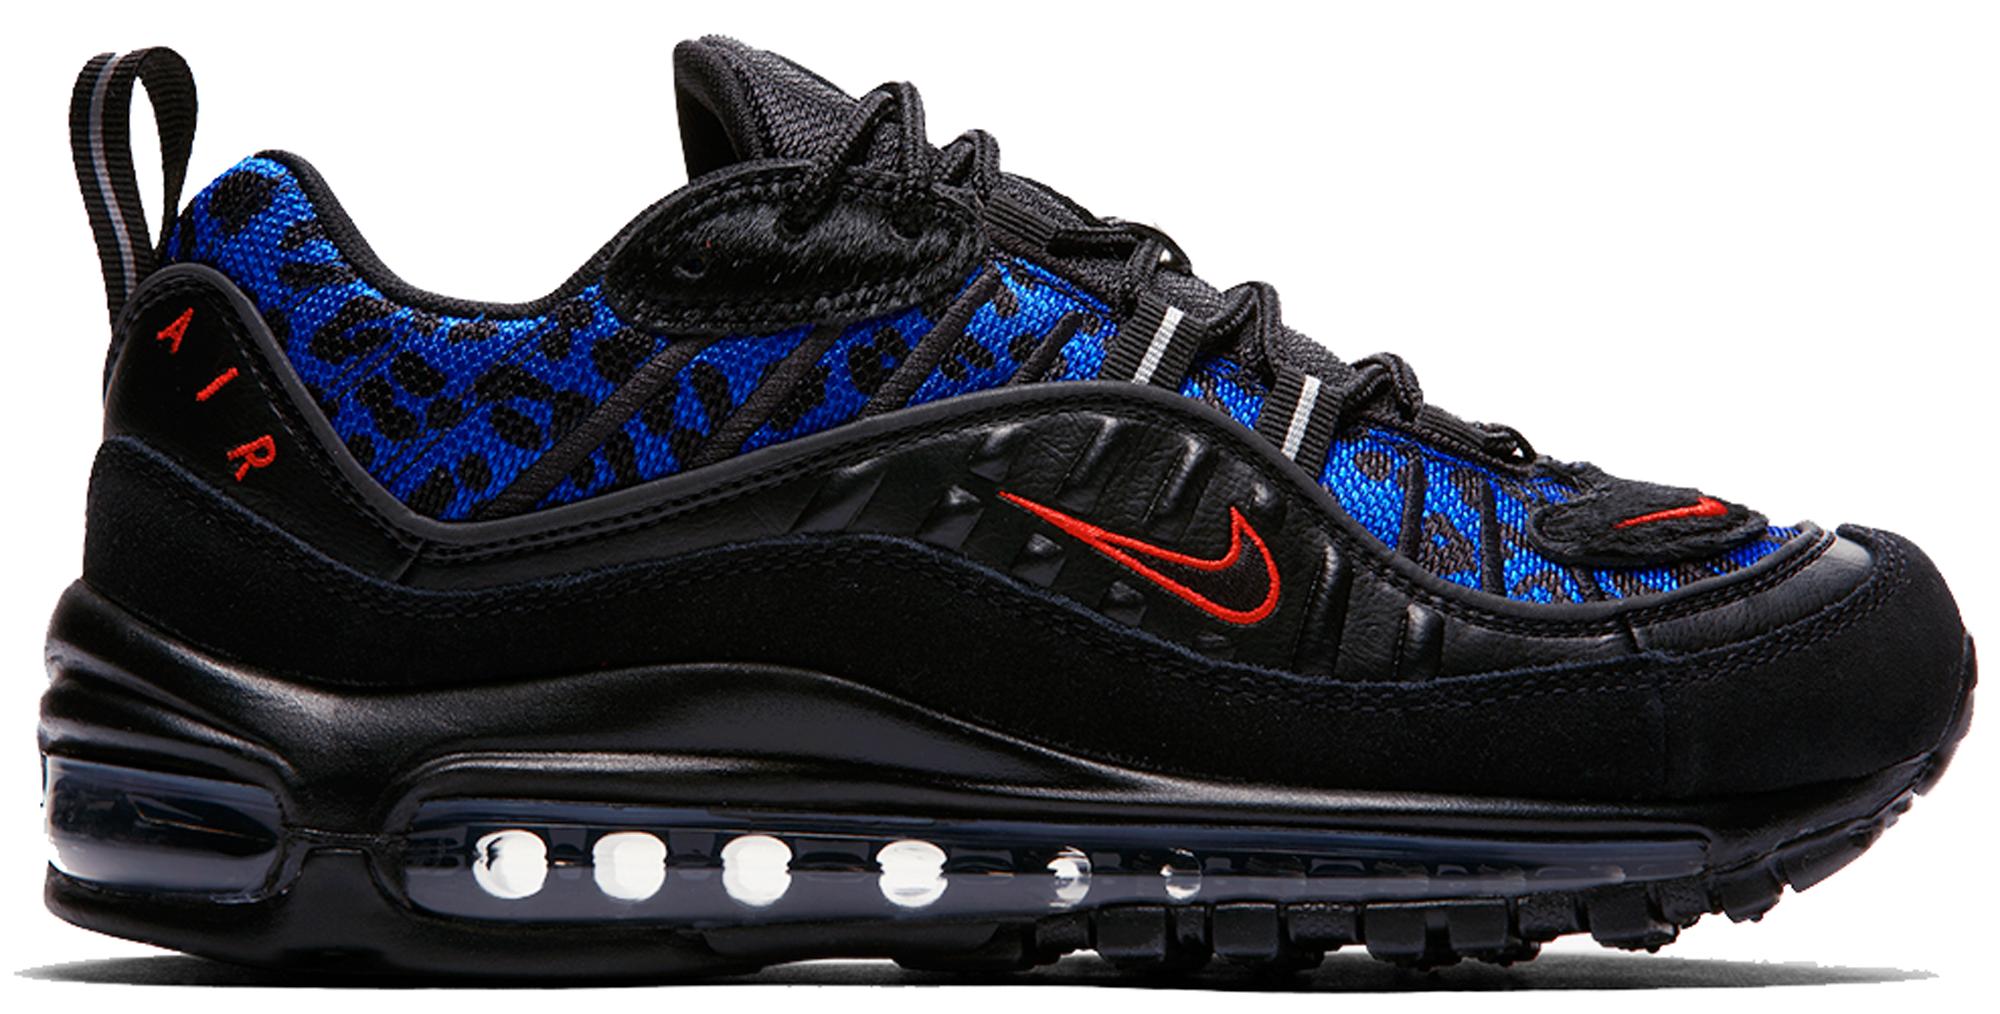 Nike Air Max 98 Black Leopard (W